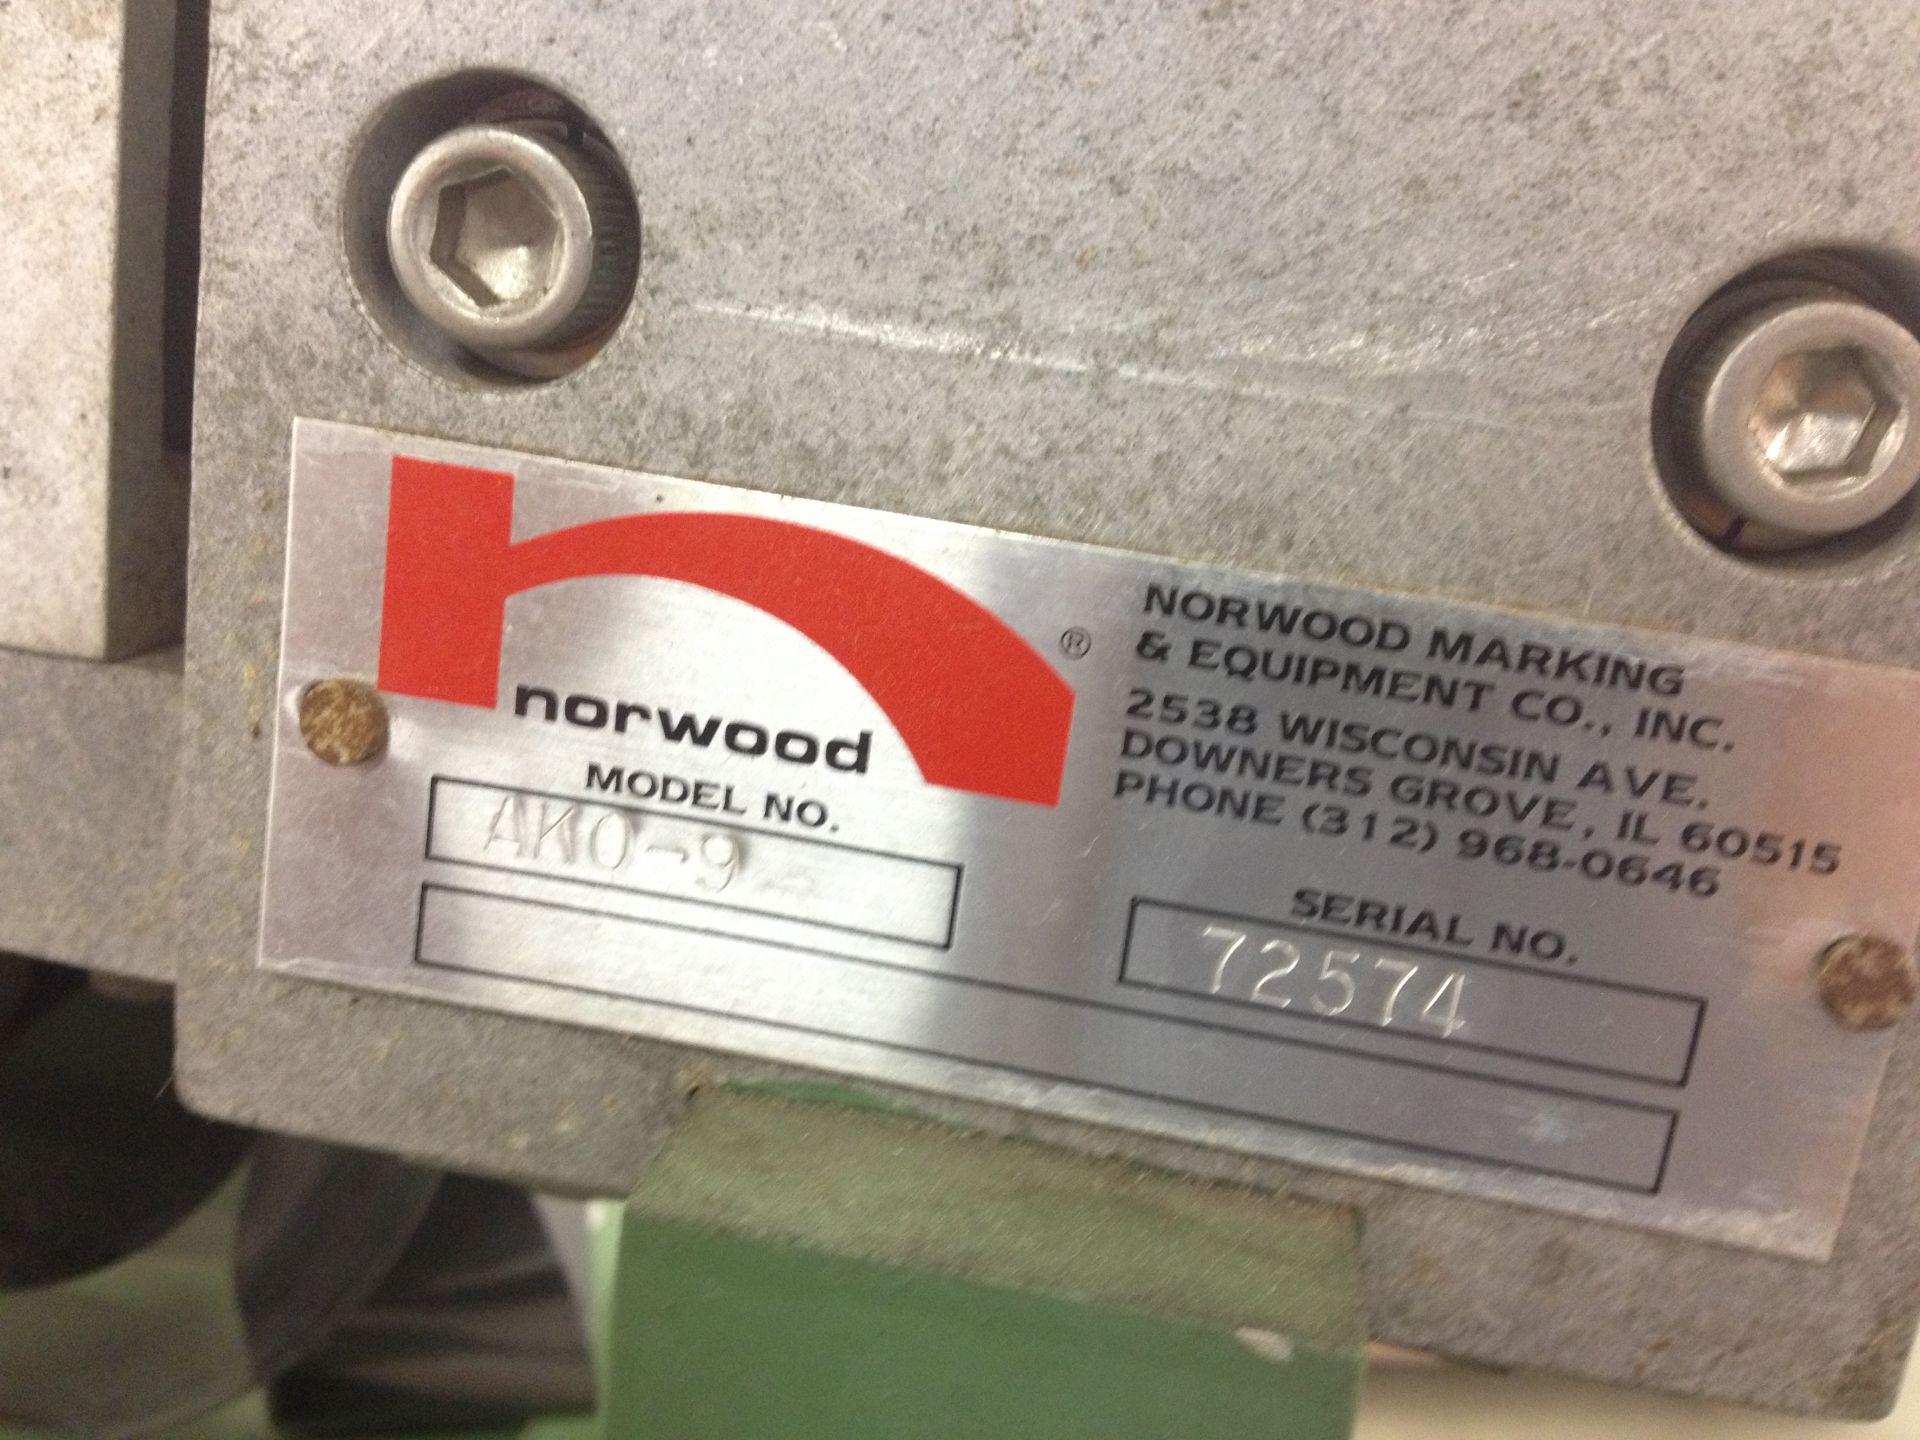 Camtron Portable Pressure Sensitive Carton Labeler - Image 5 of 5